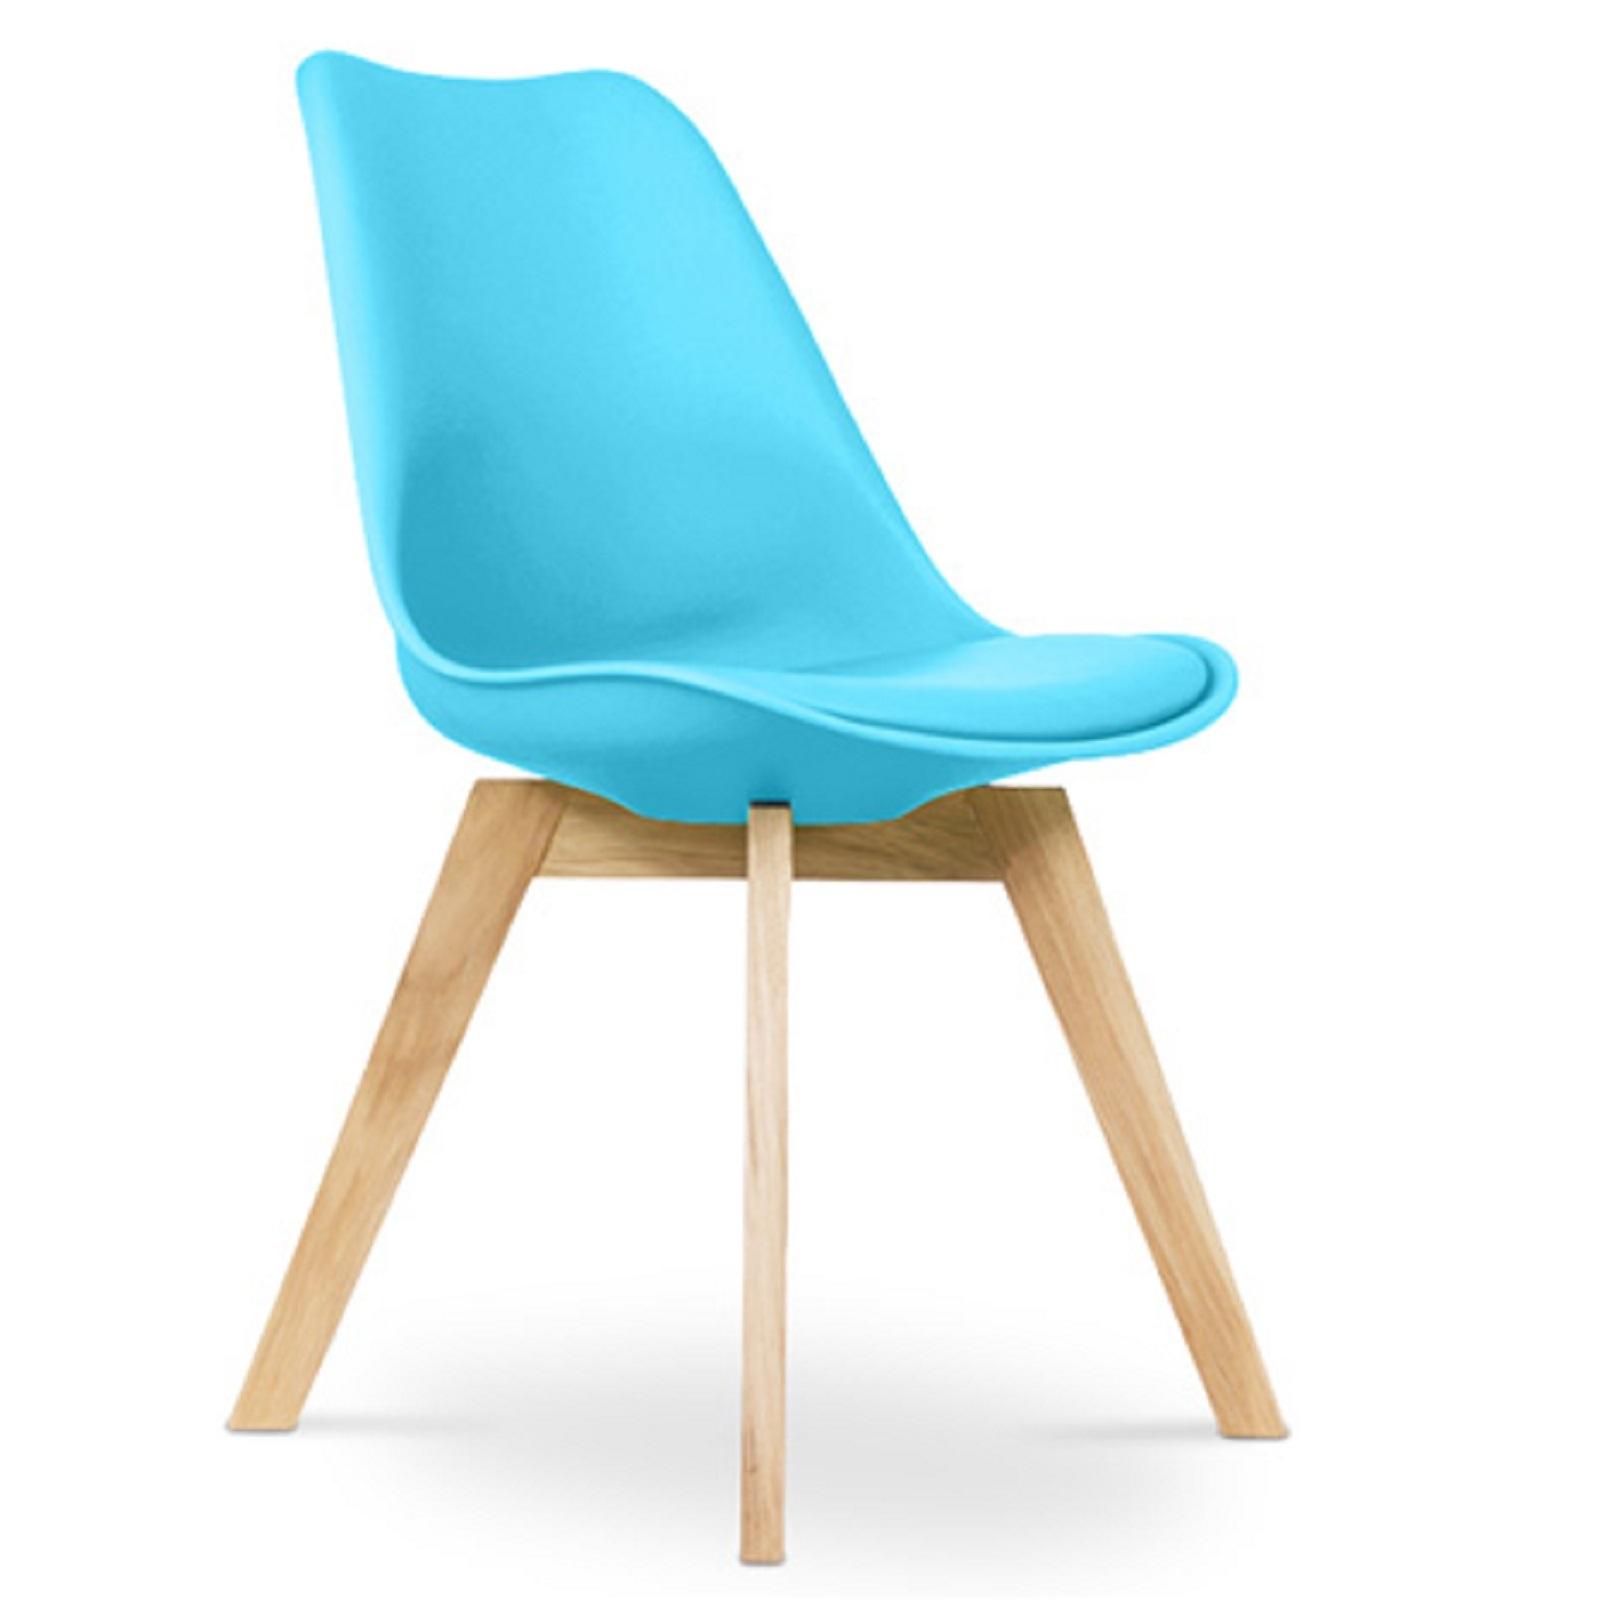 chaise scandinave avec coussin simili bleu inspir charles eames. Black Bedroom Furniture Sets. Home Design Ideas